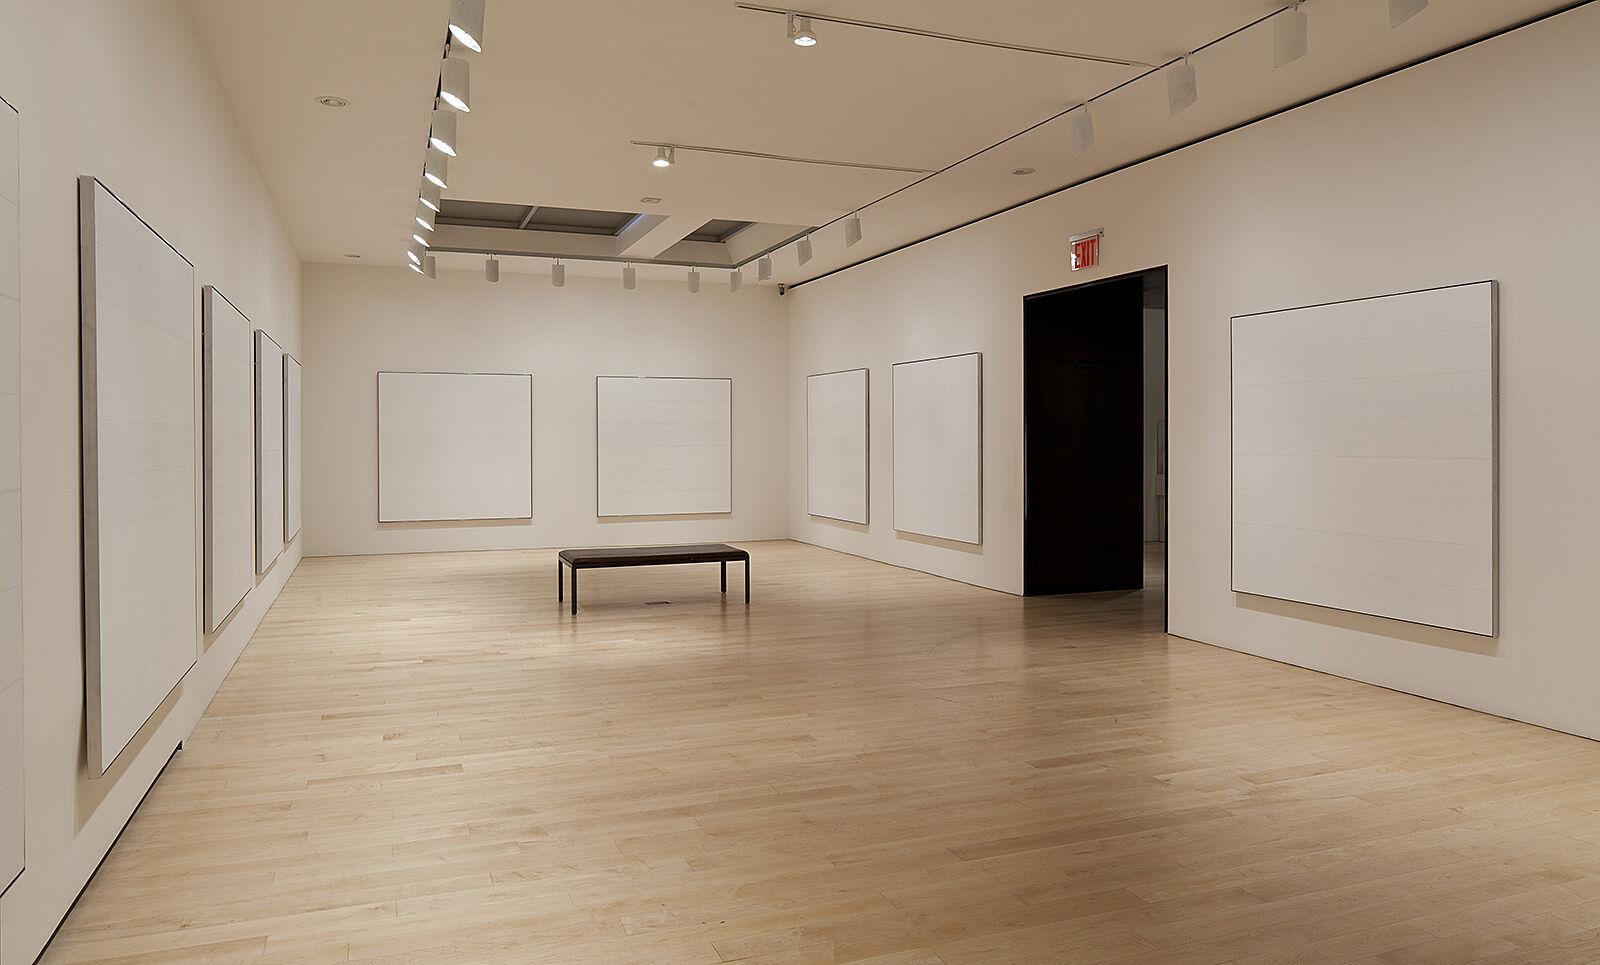 An art exhibit in a gallery